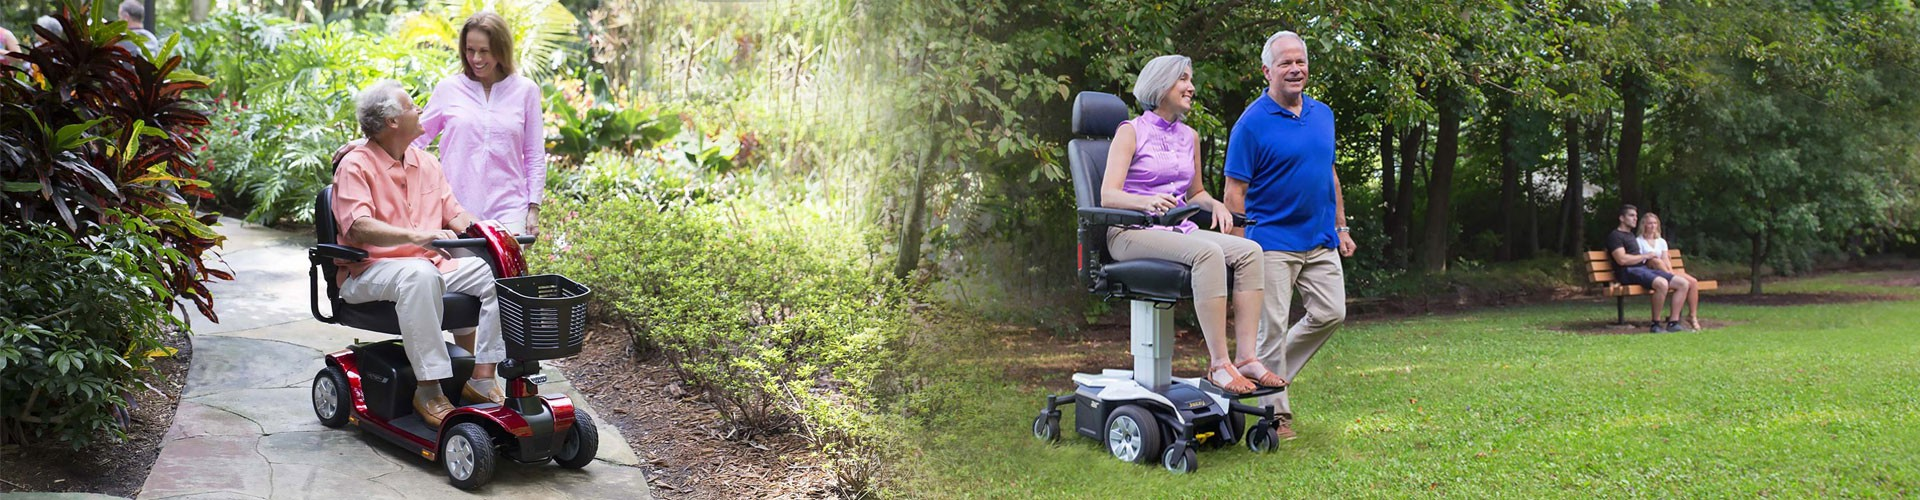 Wheelchair Equipment - Ramps, Lifts, Hand Controls, Wheelchair Vans ...